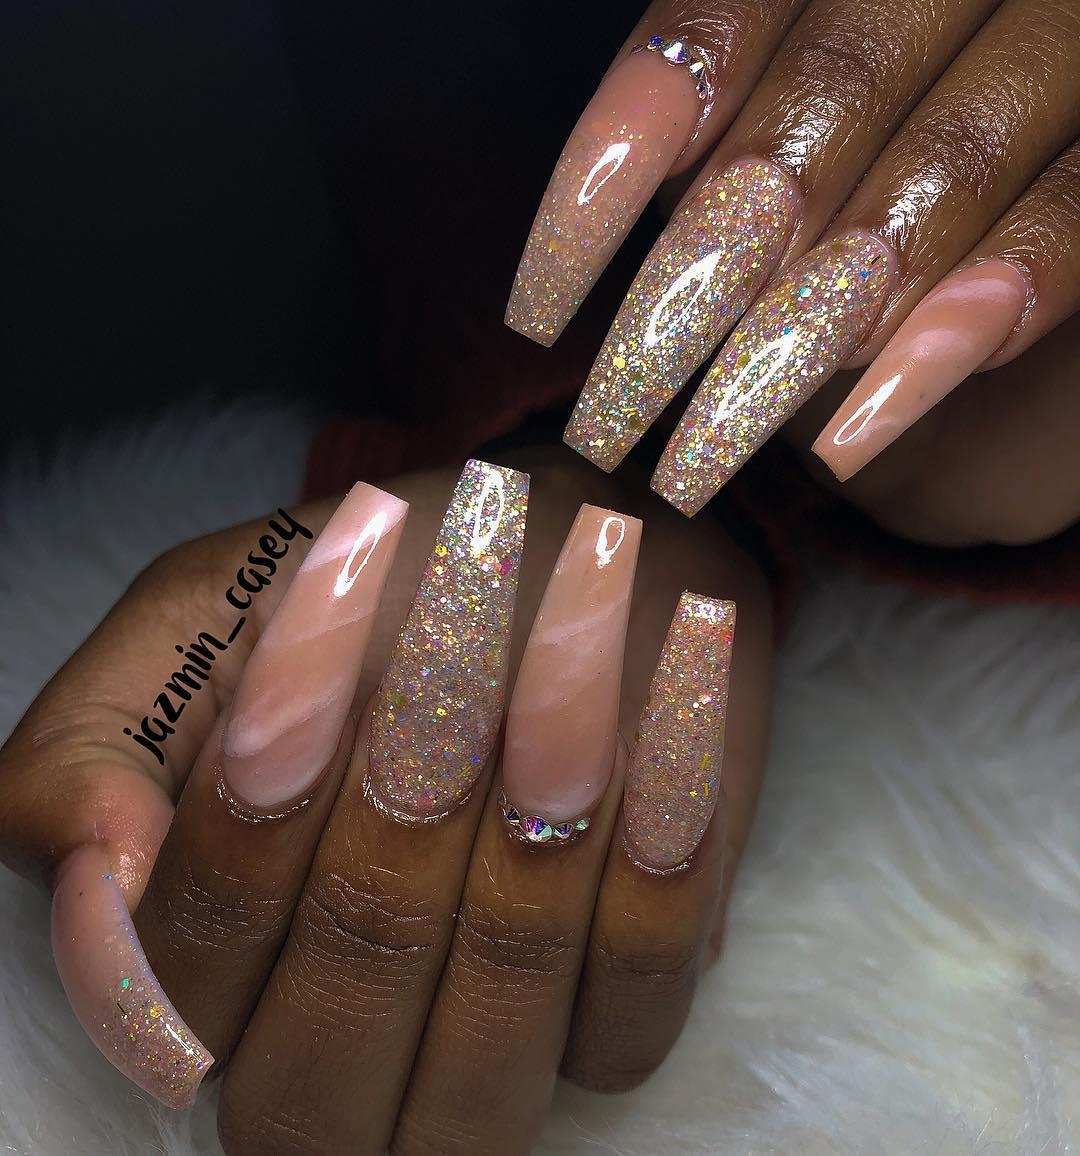 smashing glitter nail polish designs and ideas 2019 22 - Smashing Glitter Nail Polish Designs and Ideas 2019